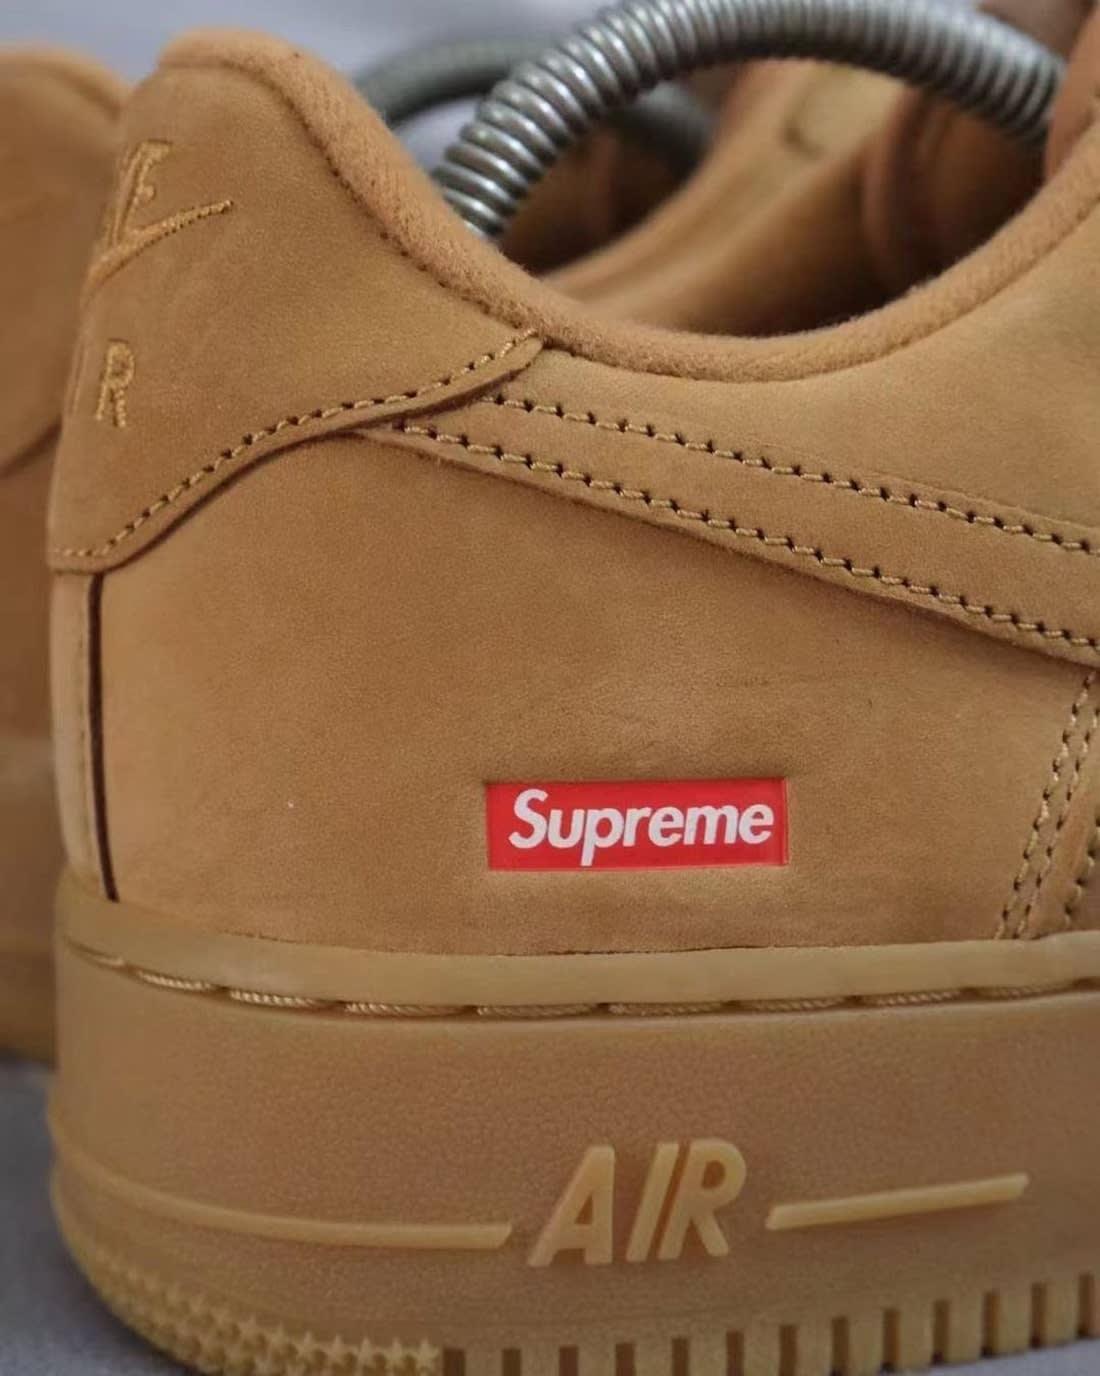 Supreme x Nike Air Force 1 Flax Release Date